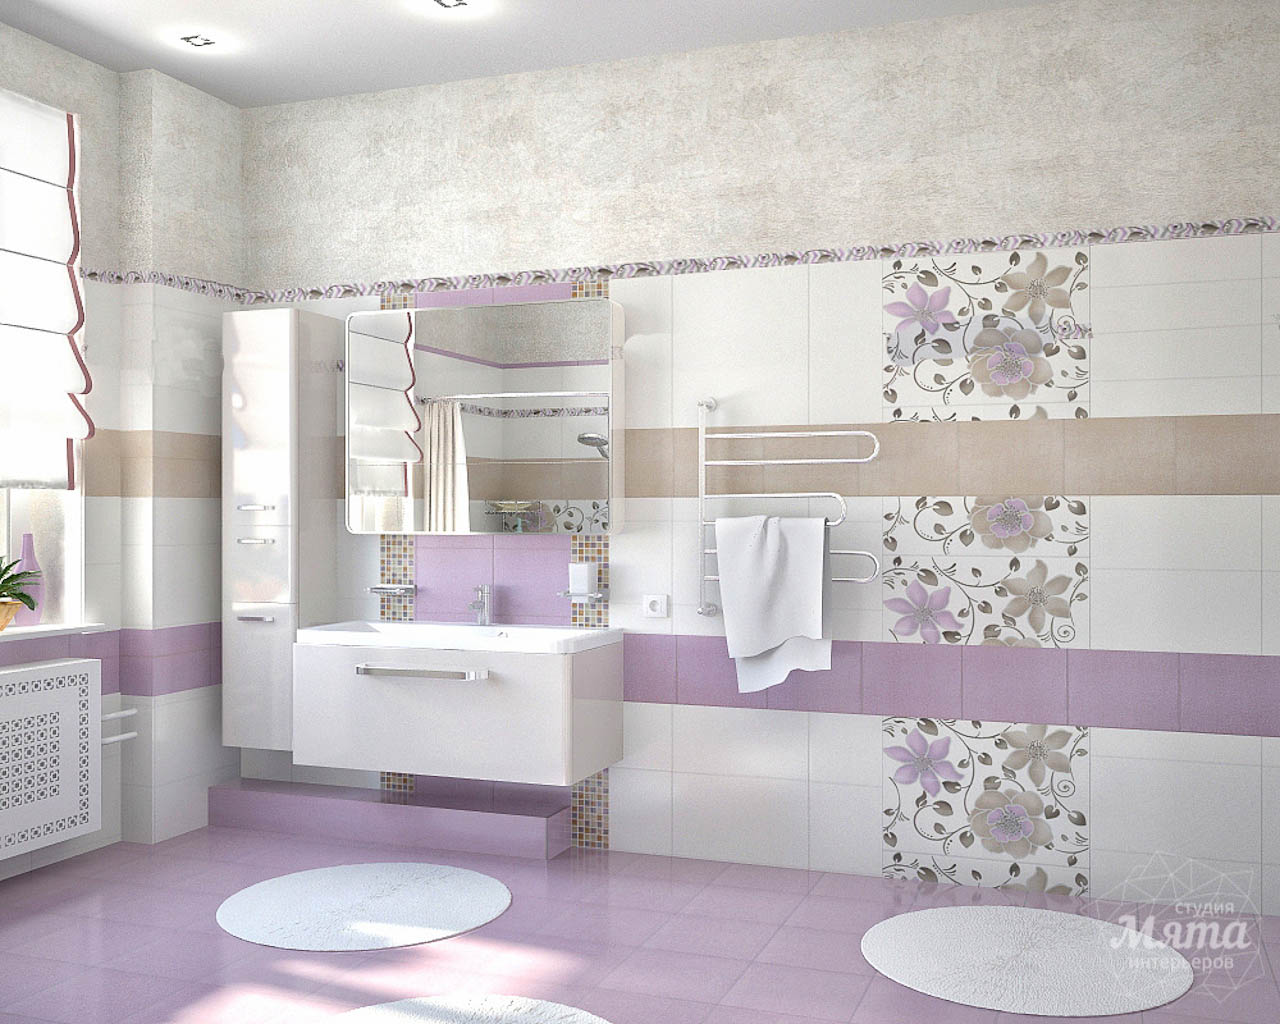 Дизайн интерьера и ремонт трехкомнатной квартиры по ул. Чкалова 124 img517535830